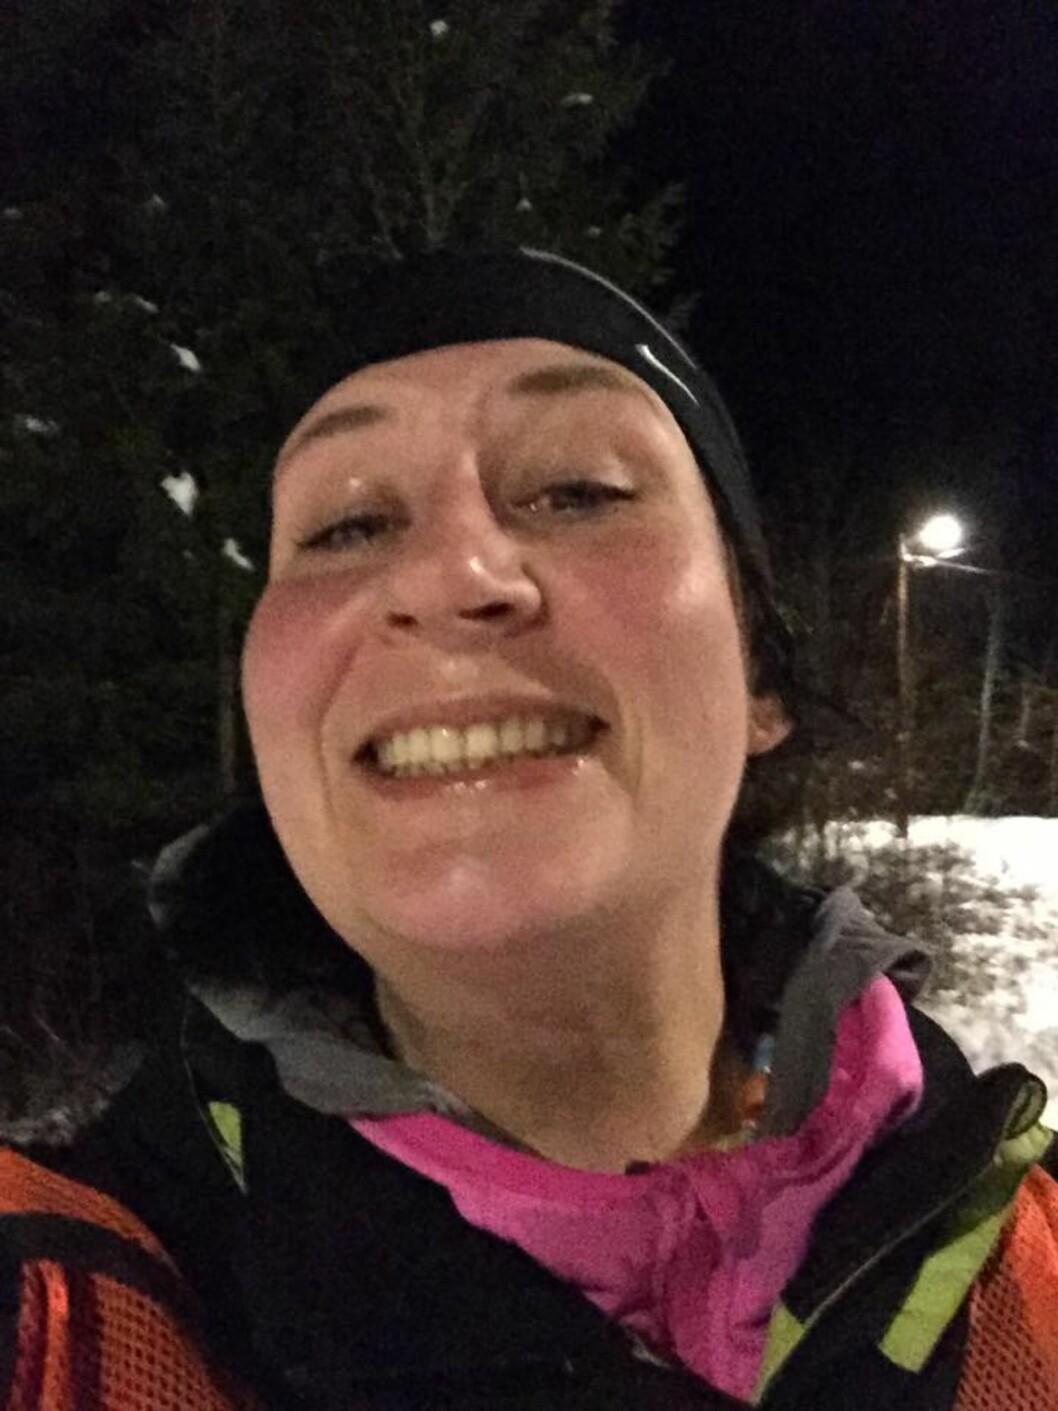 ØVER TIL SKIMILA: Skiselfie er nødvendig når man øver til KK SKimila! Foto: Privat